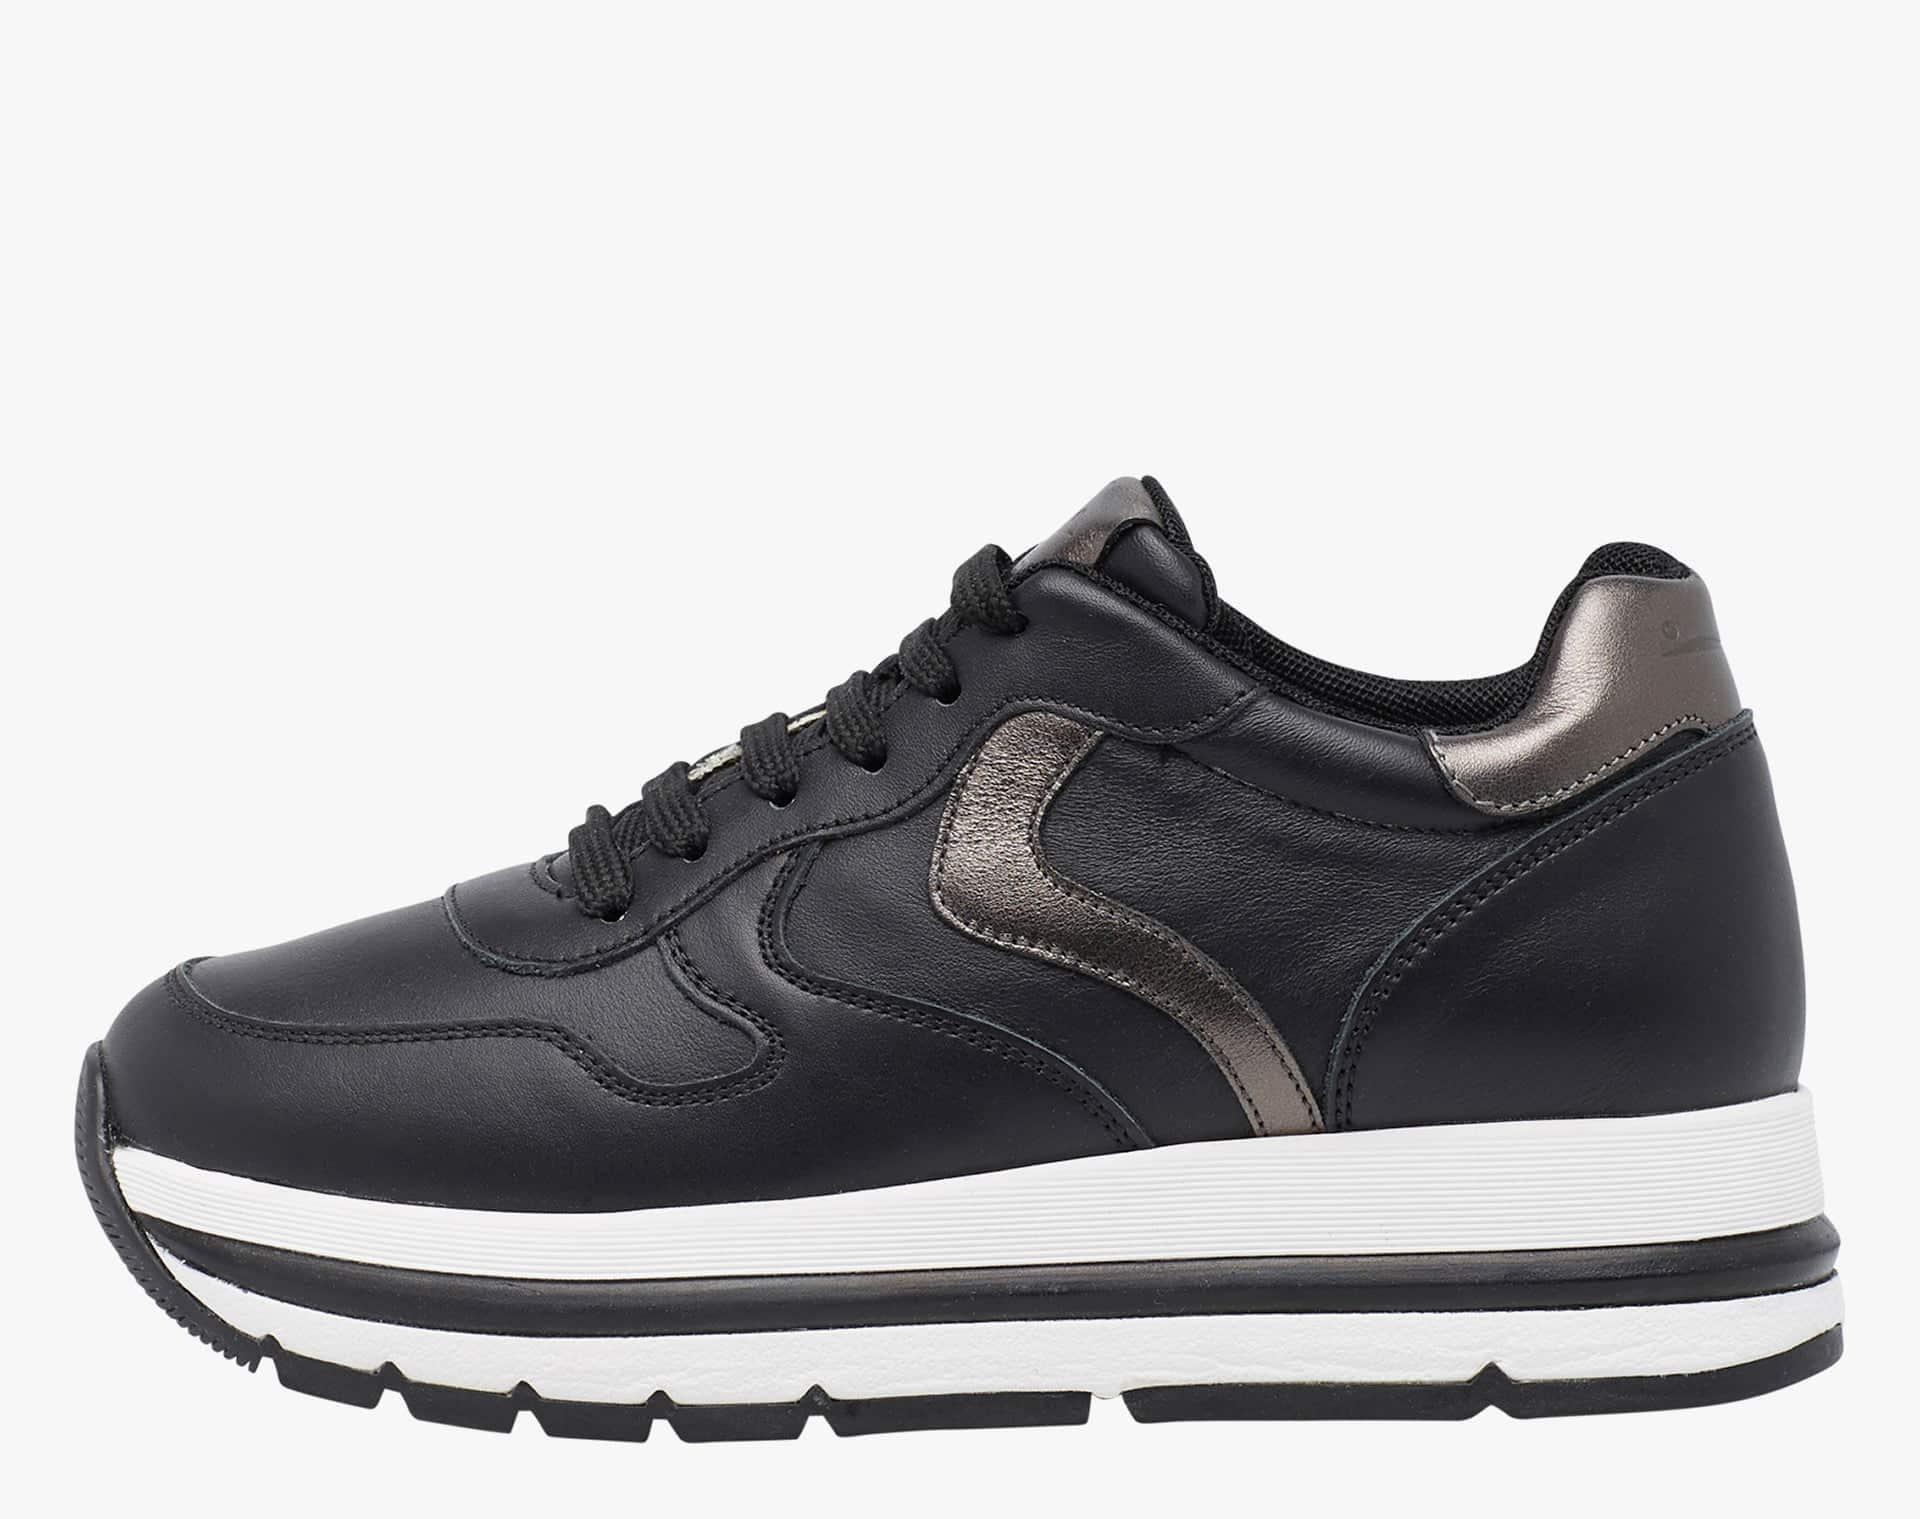 MARAN - Sneaker in vitello - Nero